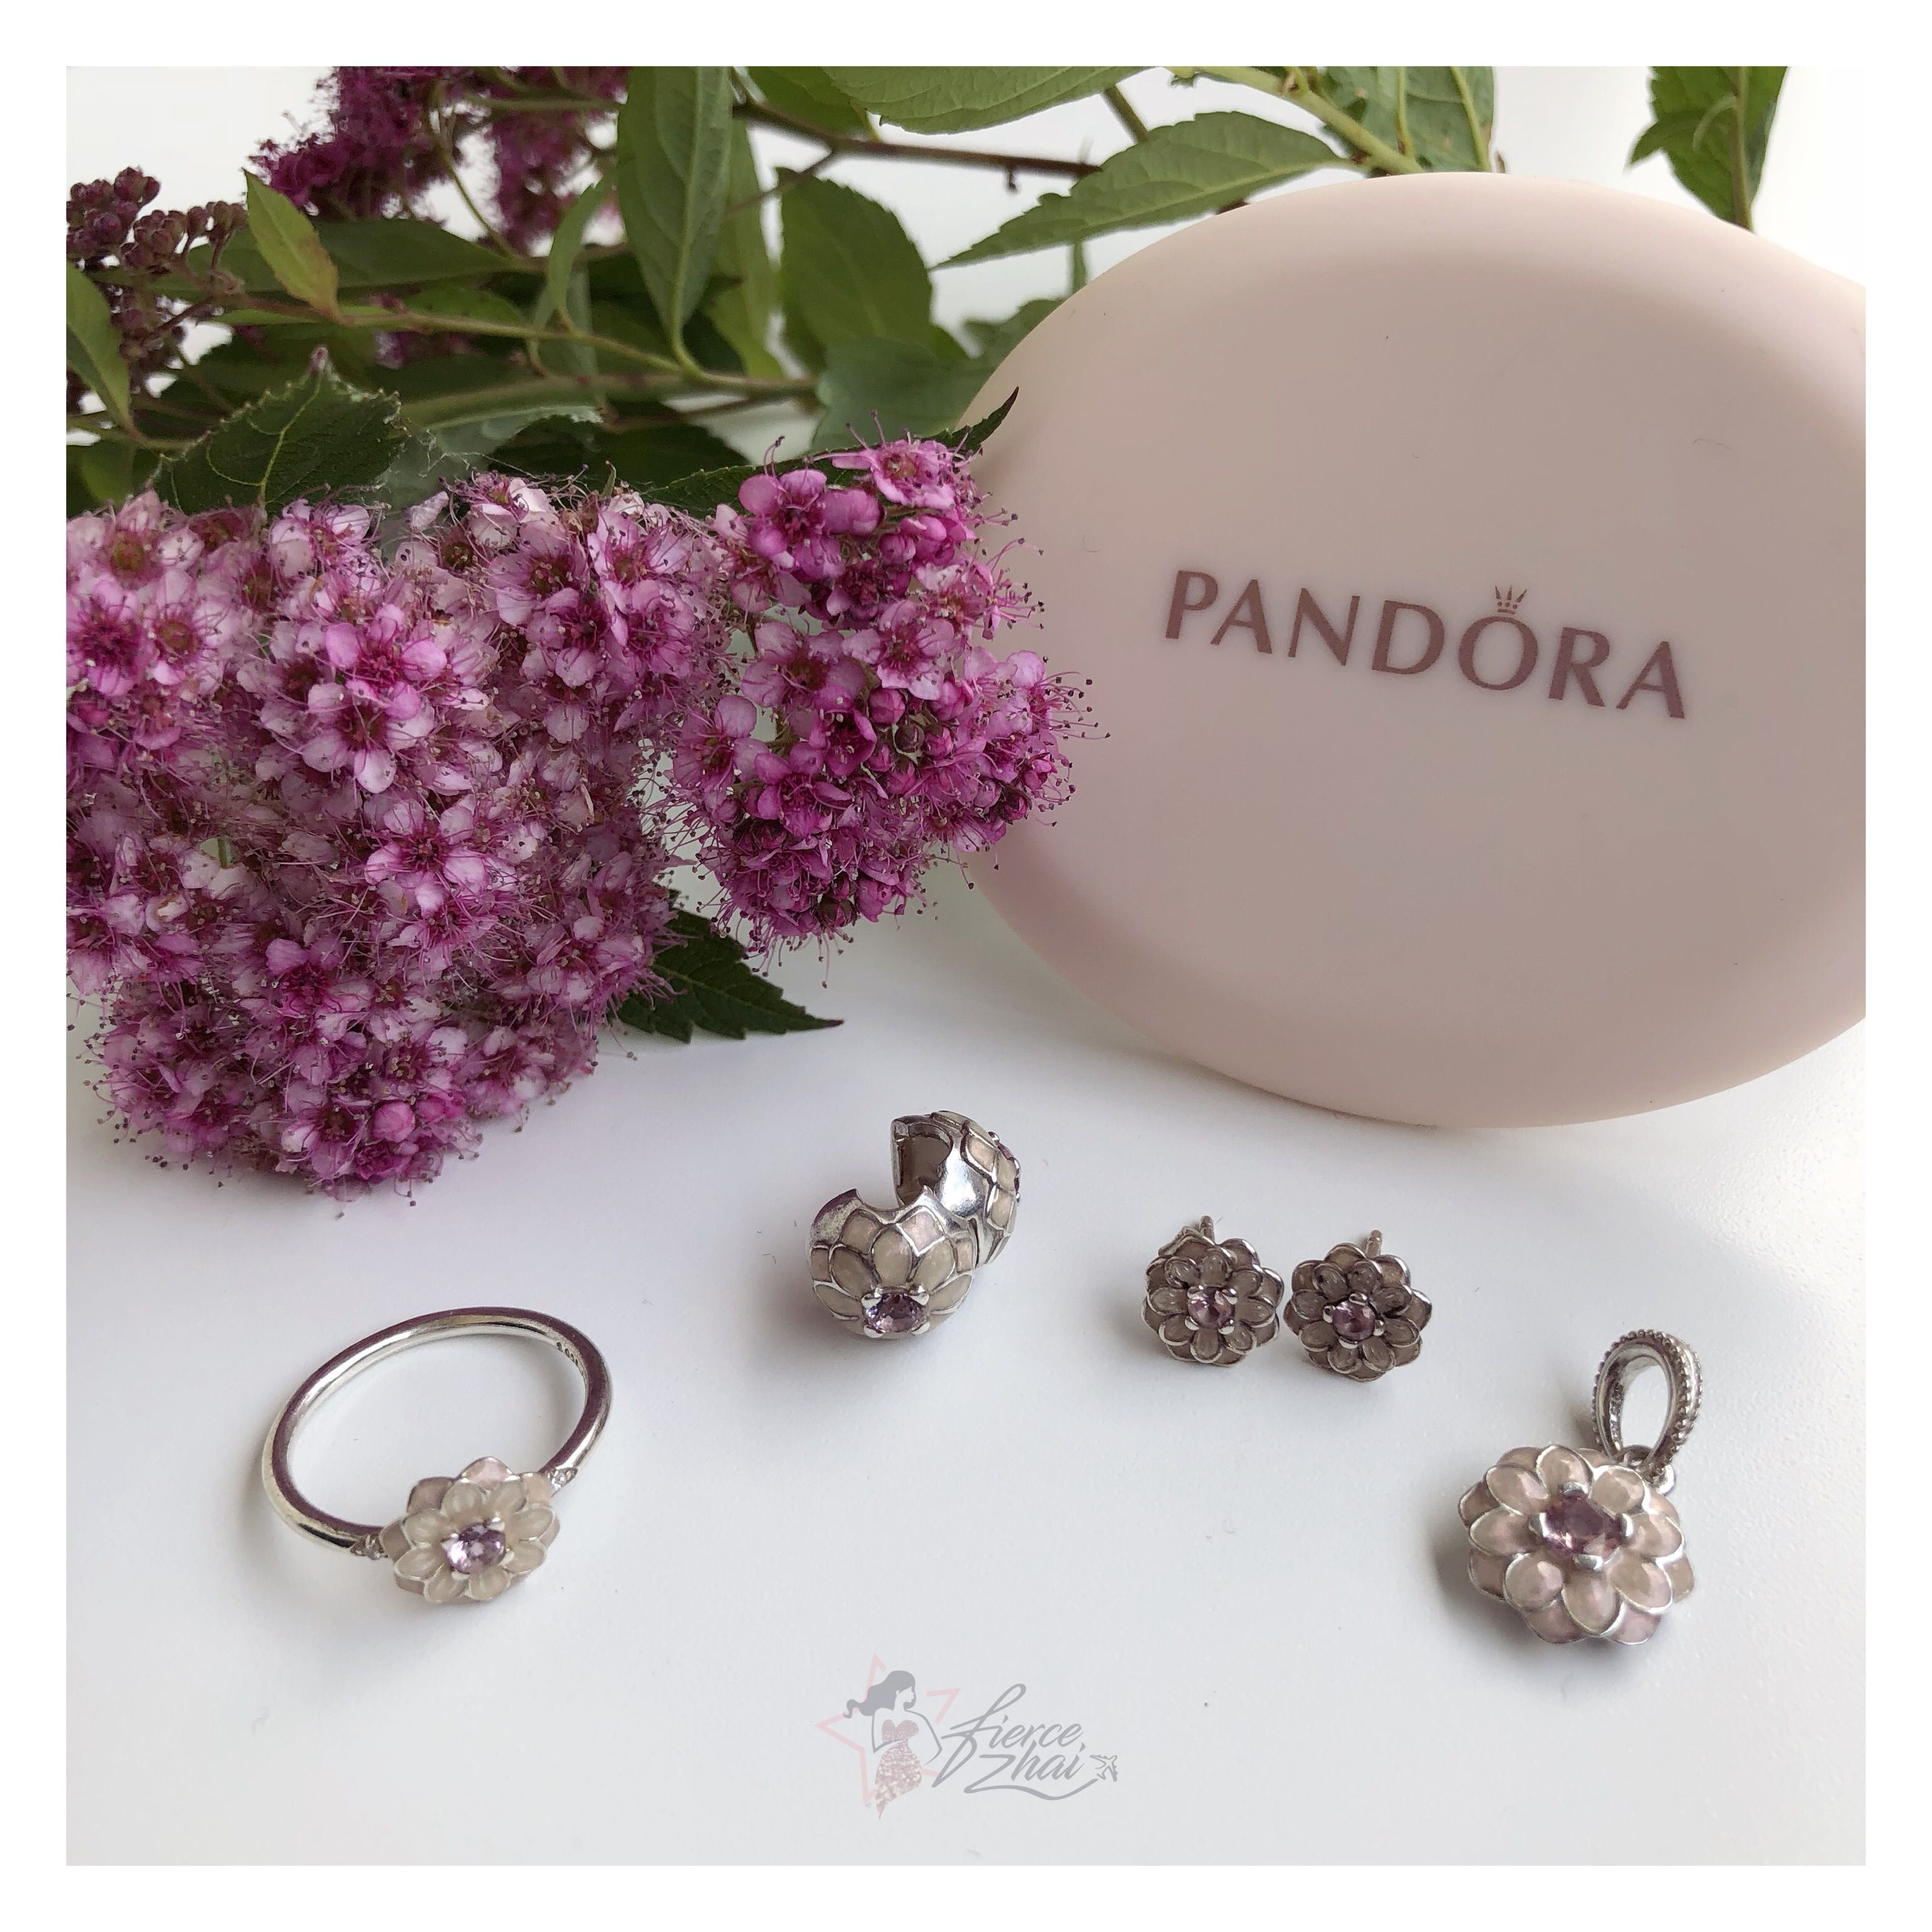 7be2189ef TheOfficialPandora on this Photo: . Pandora Blooming Dahlia 🌸 Pandora  Blooming Dahlia Ring 🌸 Pandora